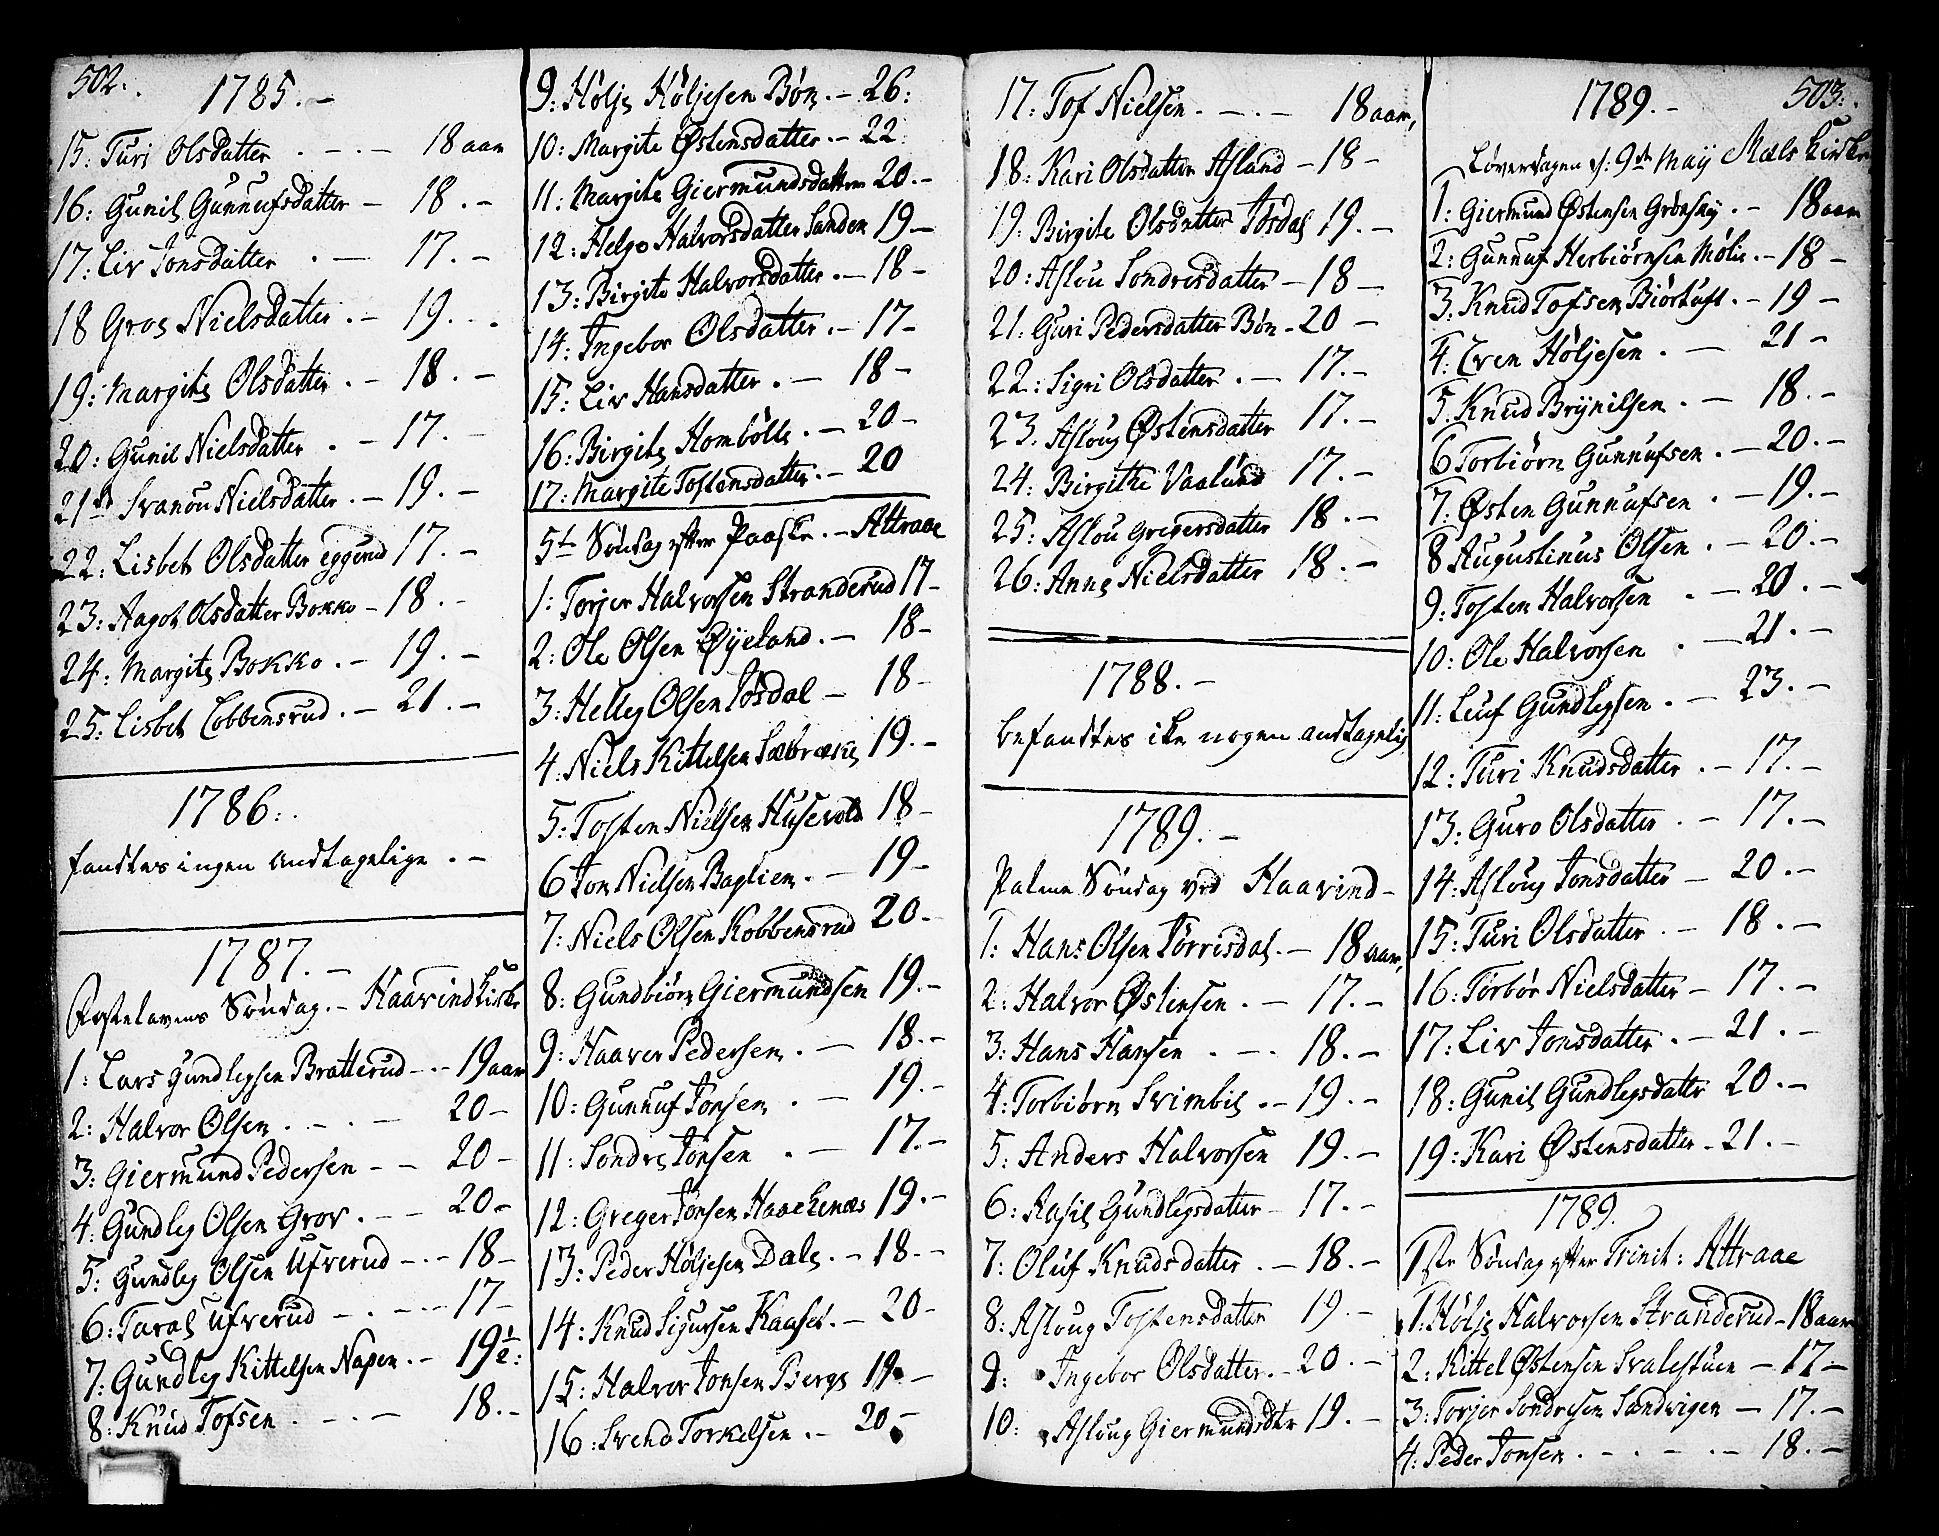 SAKO, Tinn kirkebøker, F/Fa/L0002: Ministerialbok nr. I 2, 1757-1810, s. 502-503